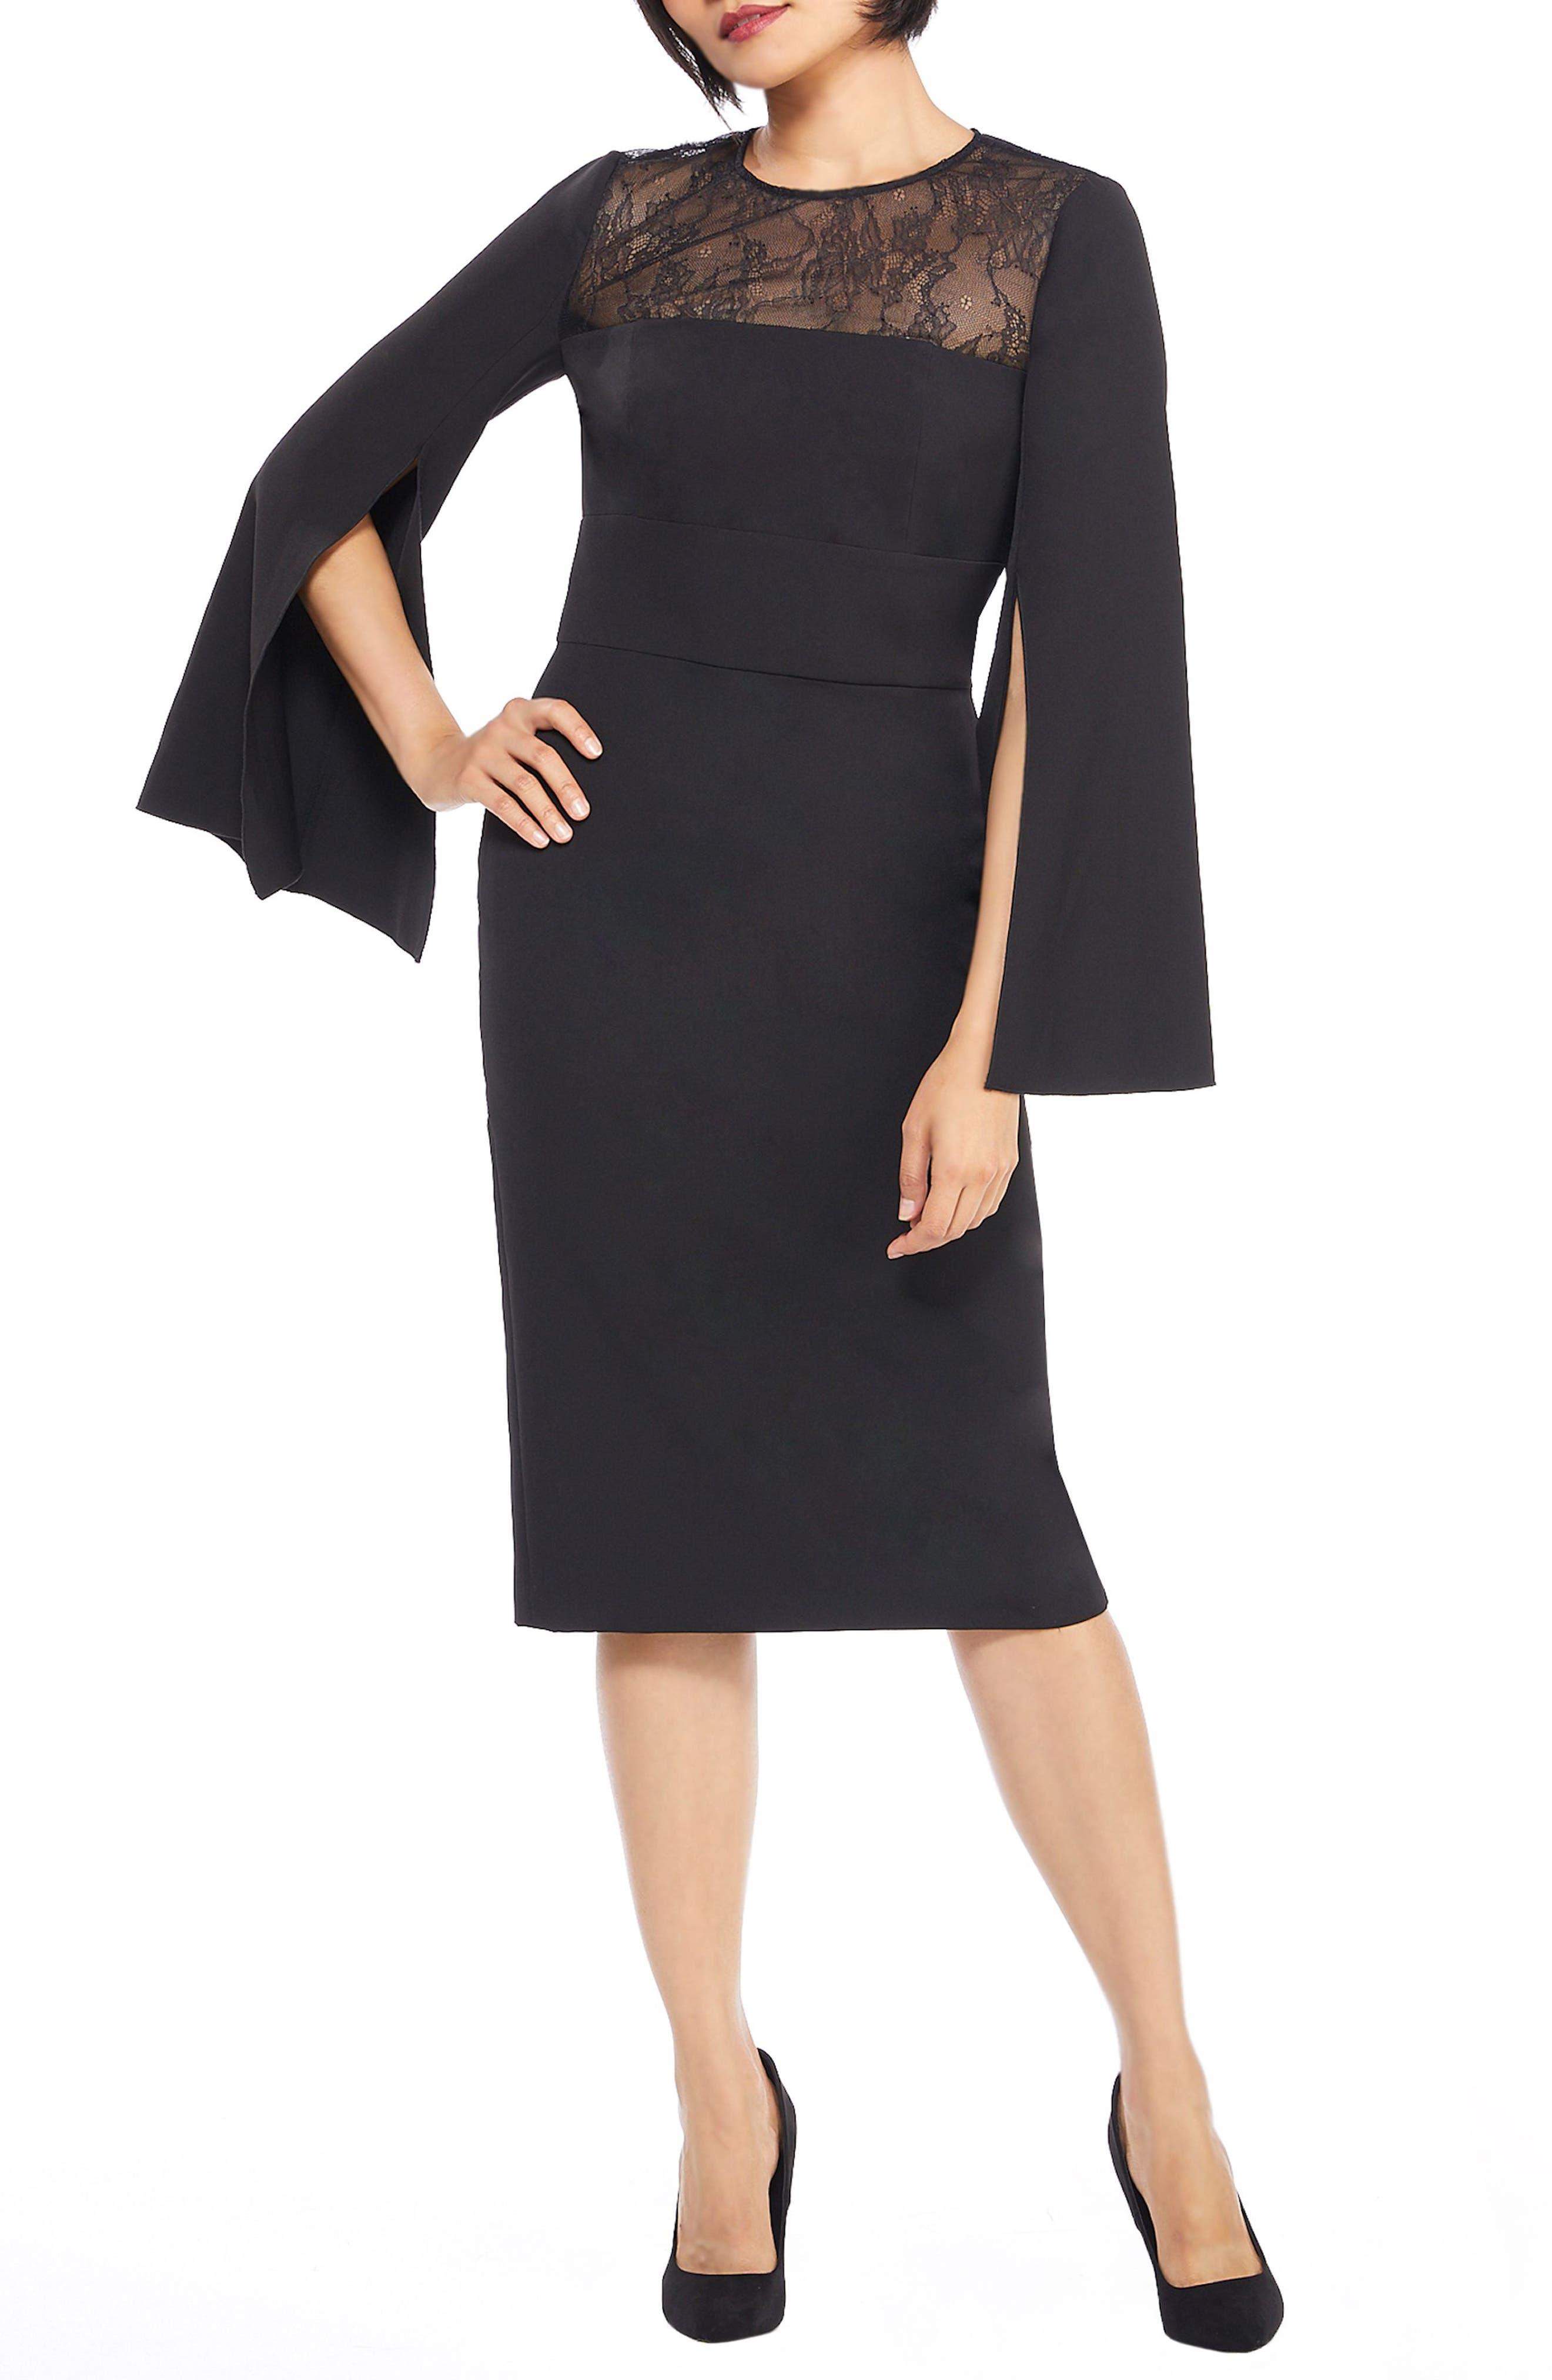 Maggy London Crepe & Lace Sheath Dress, Black